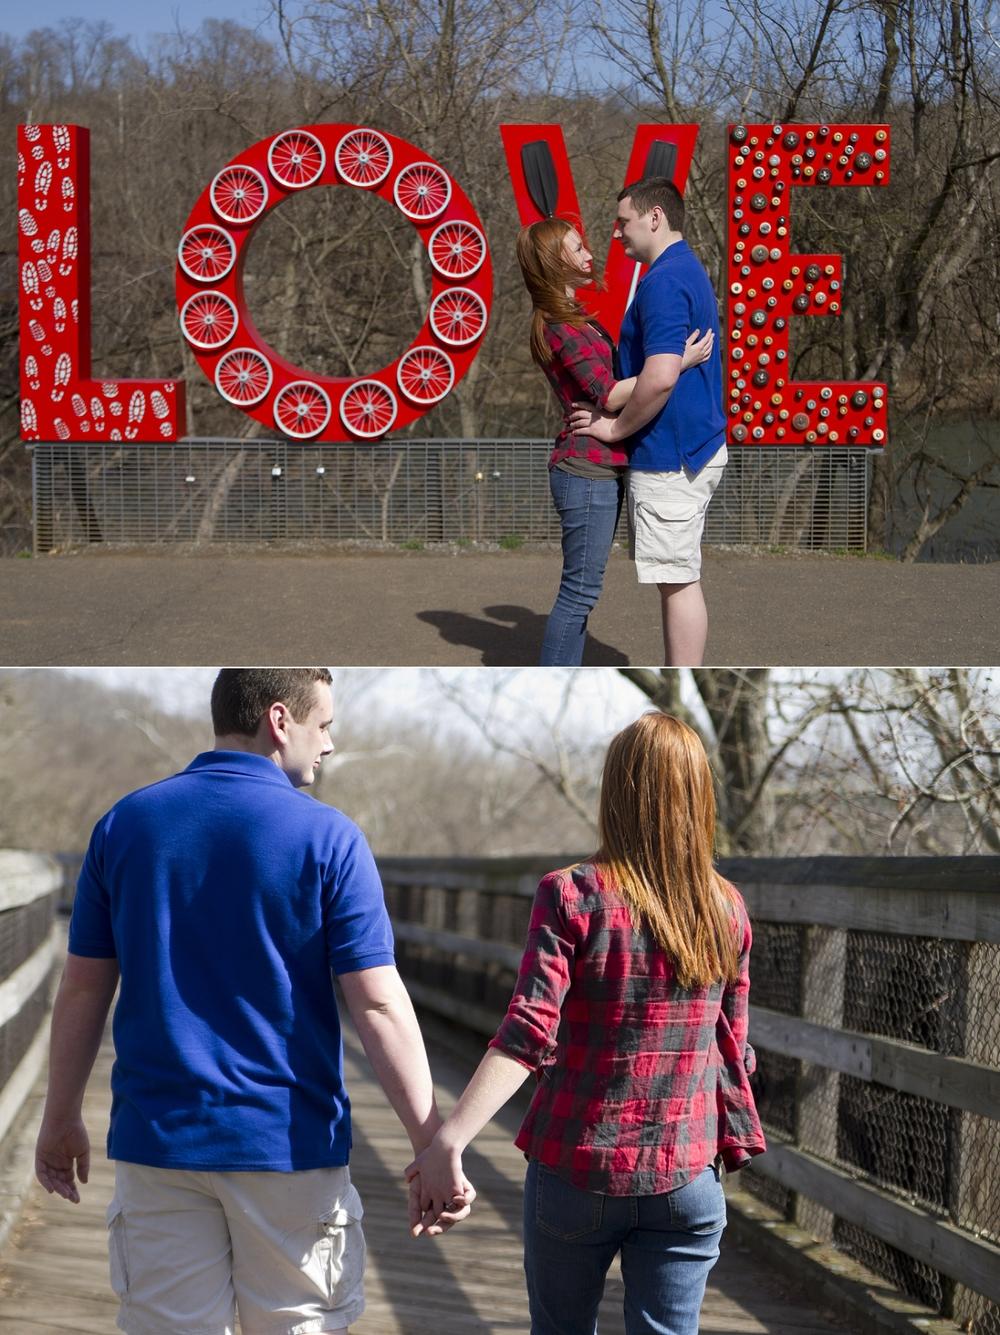 Lynchburg_Engagement_Photos_Lydia_Drew__0003.jpg